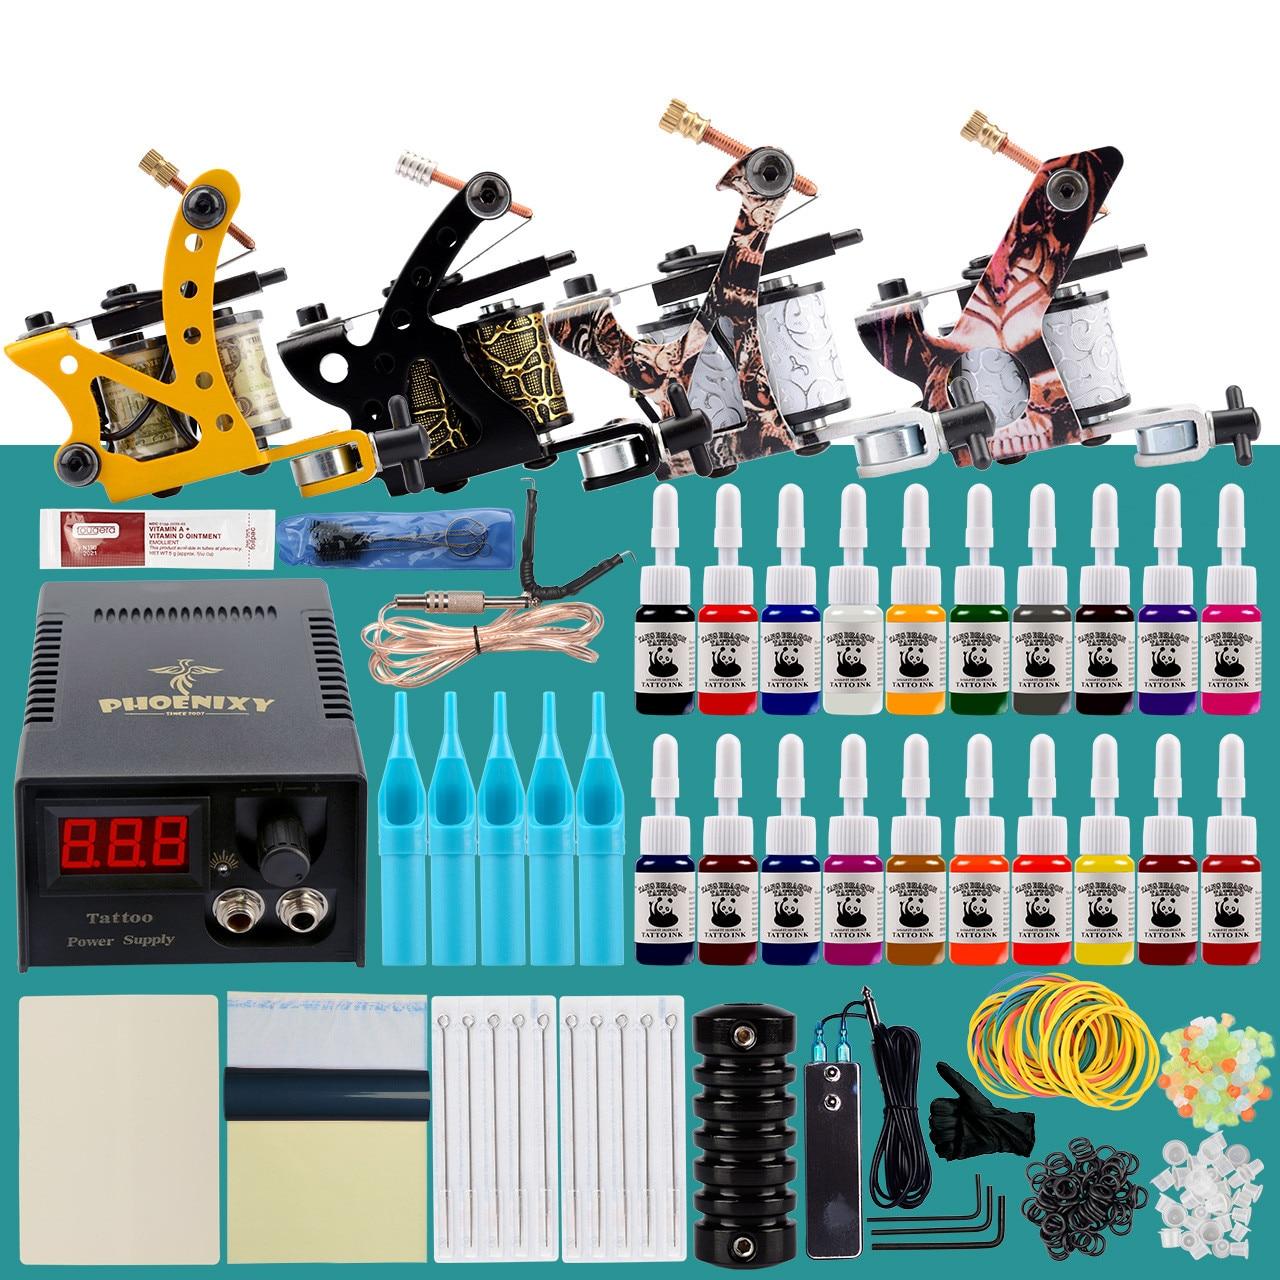 Professional Tattoo Kit Tattoo Machines Set Coil Guns LCD Power Supply Permanent Ink Tattoo Equipment Makeup Complete Tattoo Set(China)